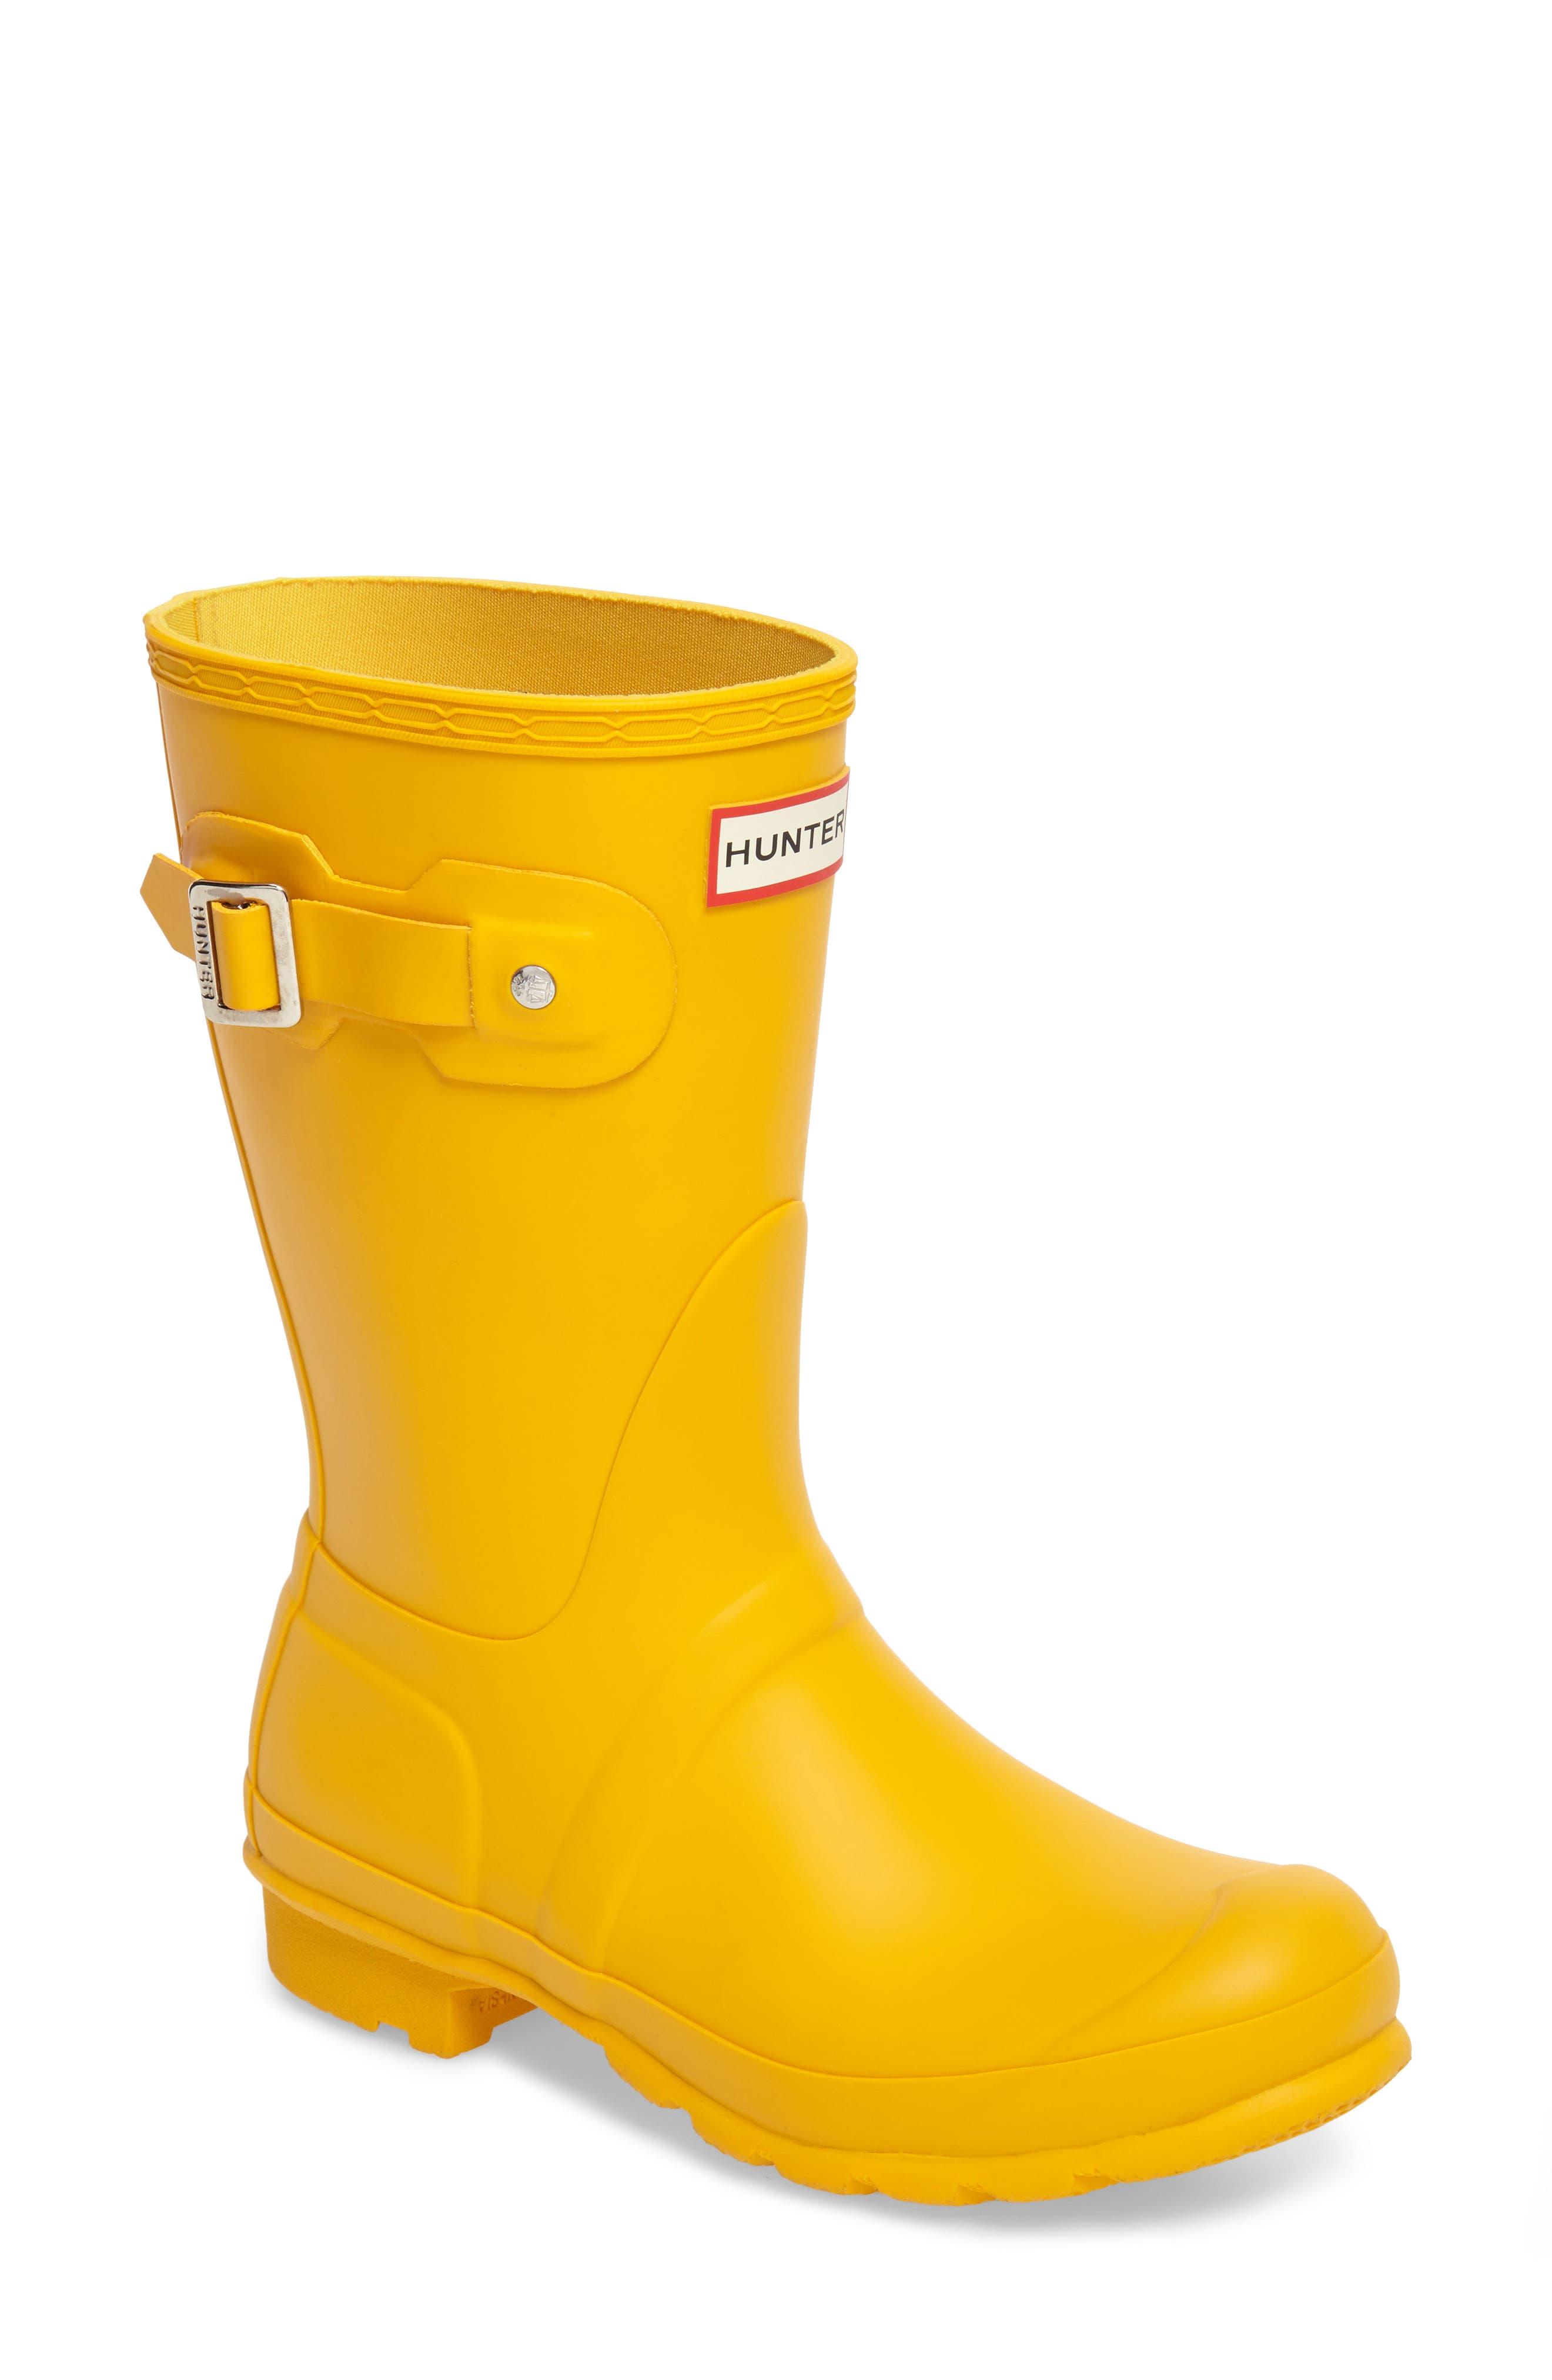 HUNTER, Original Short Waterproof Rain Boot, Main thumbnail 1, color, YELLOW/ YELLOW